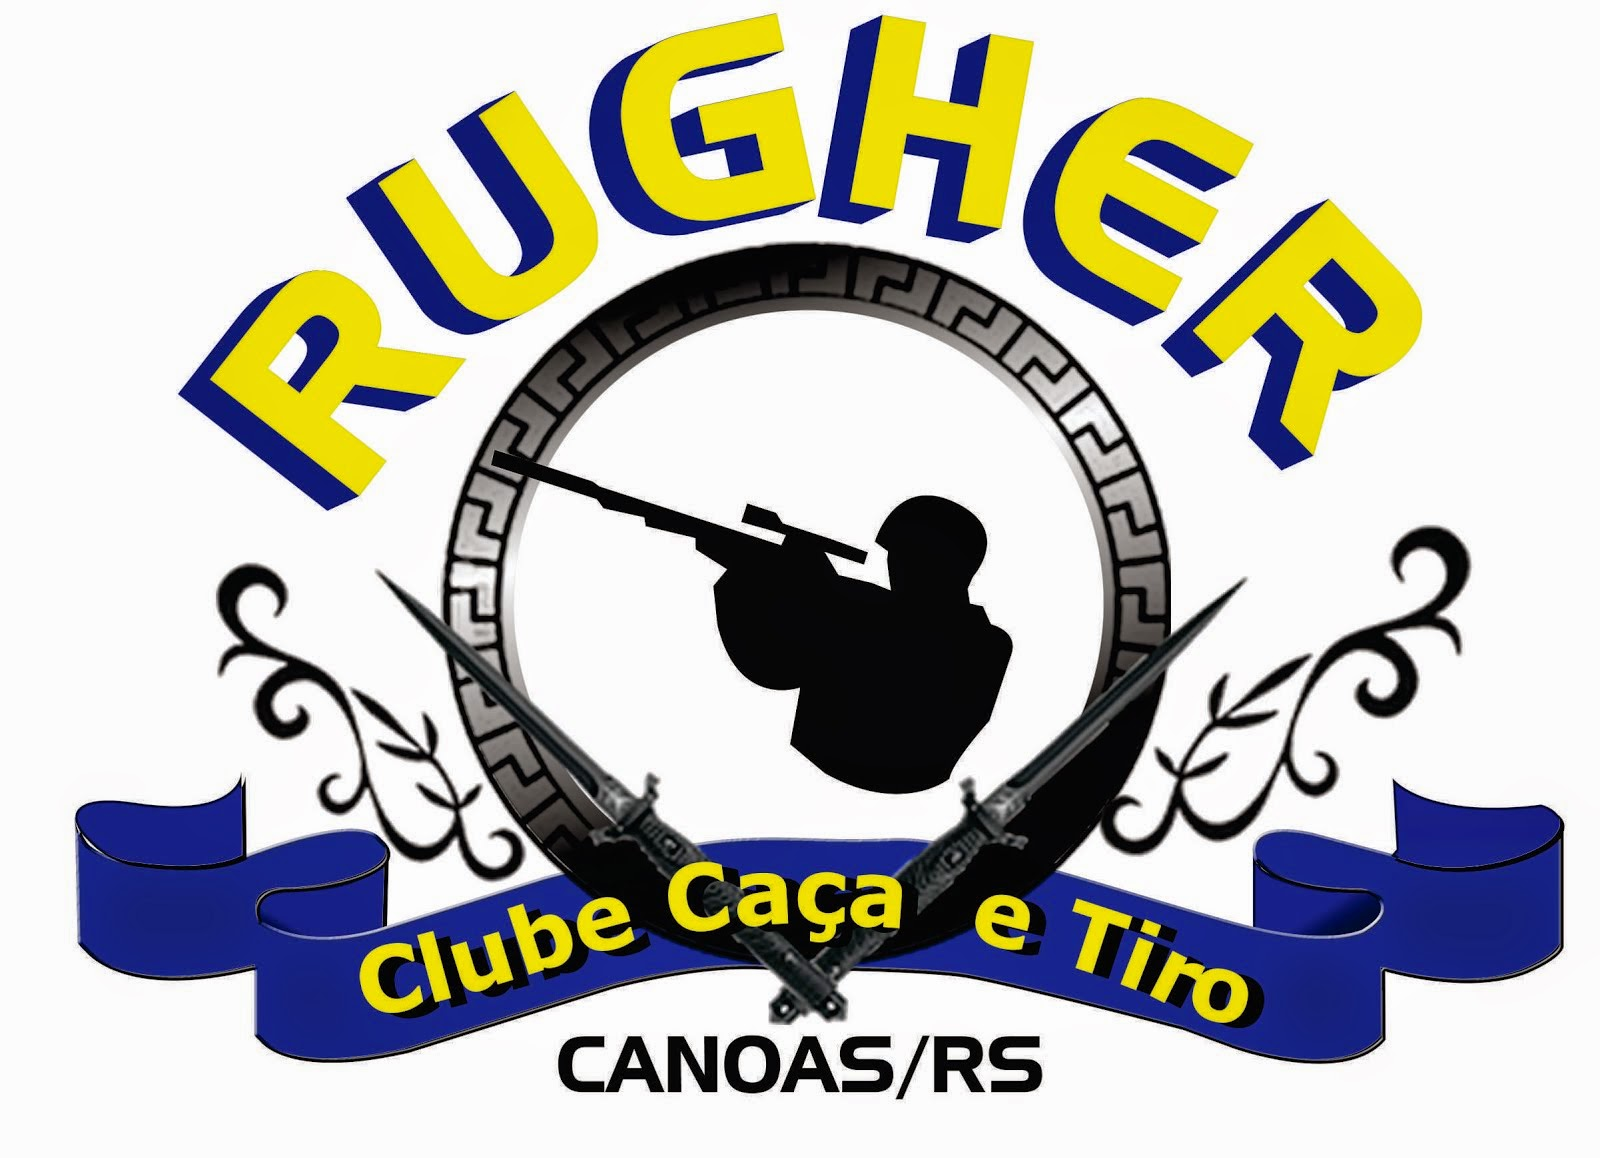 Rugher Clube de Caça e Tiro